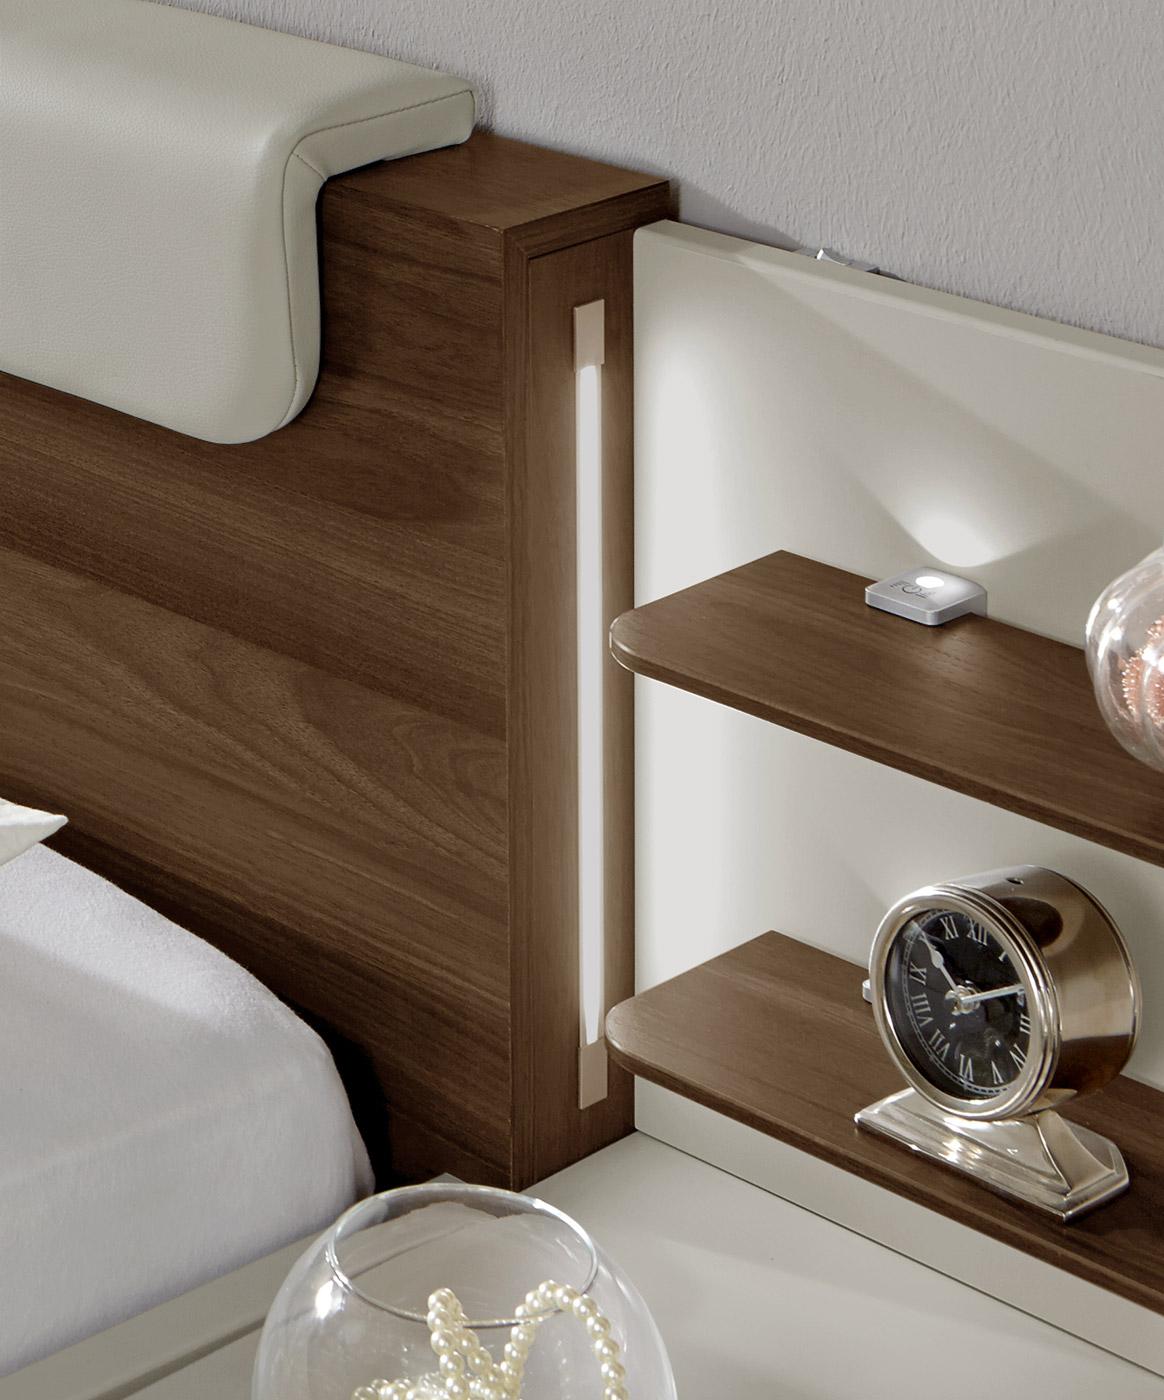 bett mit beleuchtung thema bett mit beleuchtung with bett. Black Bedroom Furniture Sets. Home Design Ideas